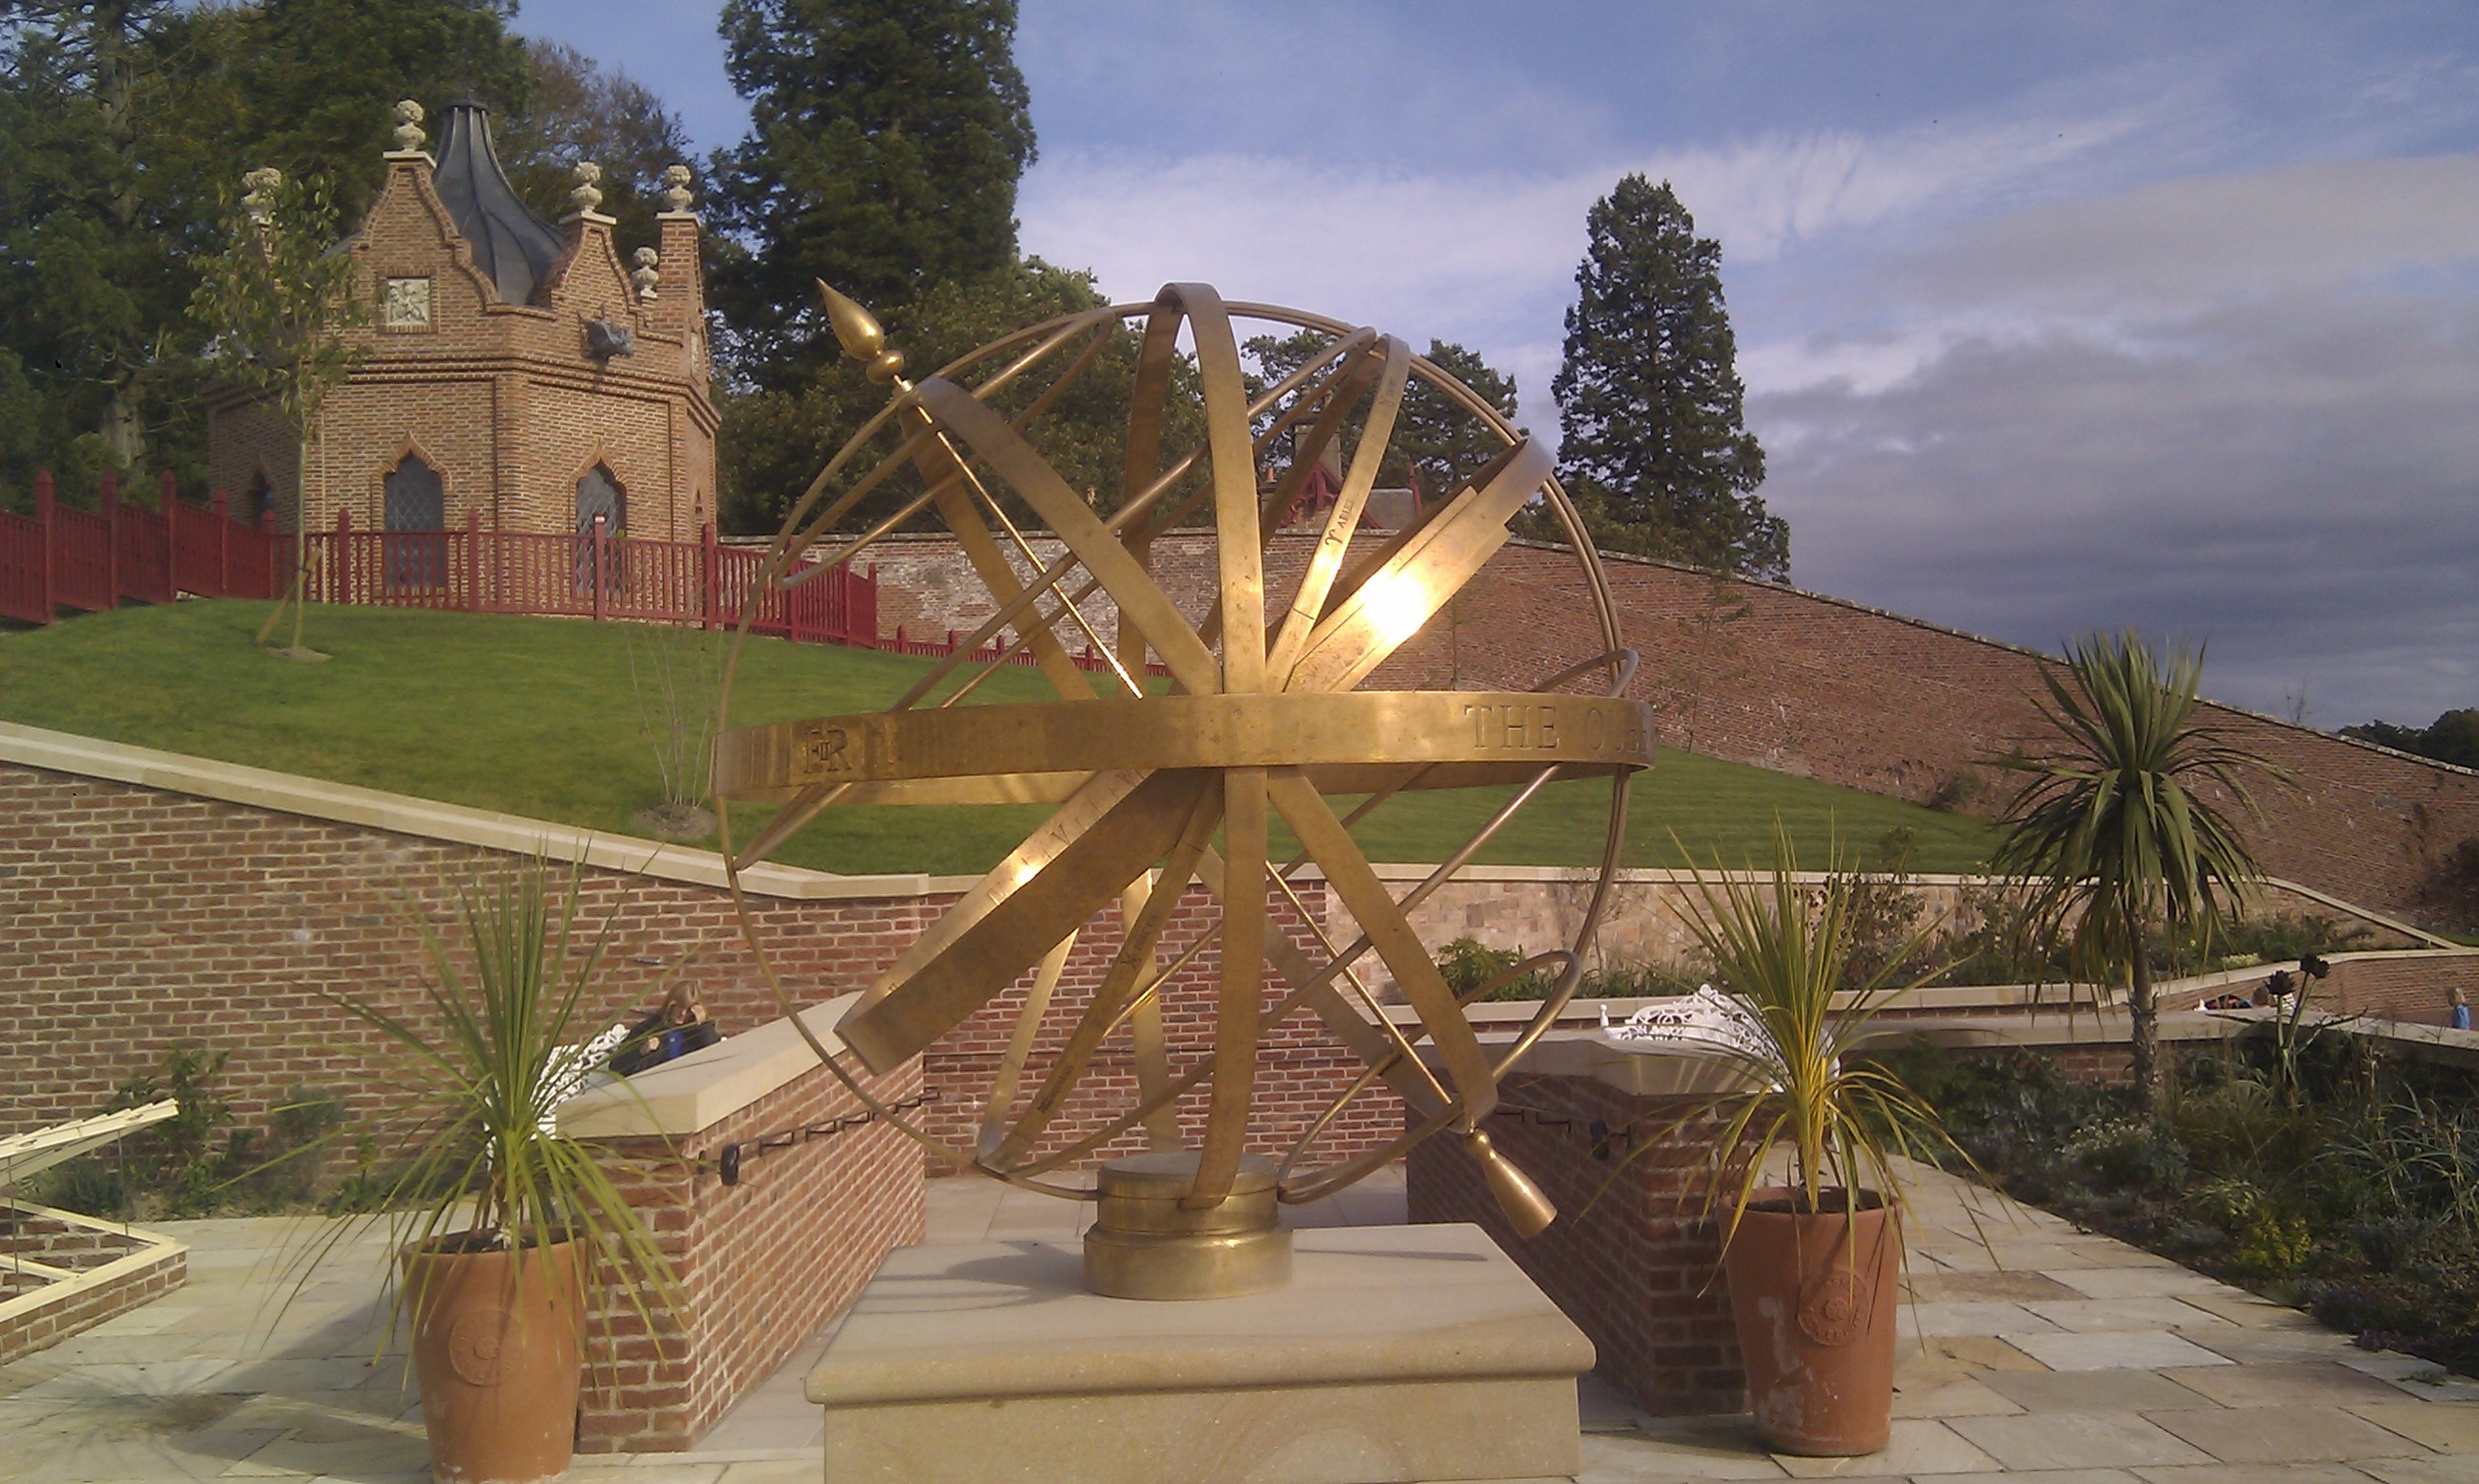 File:Armillary sphere sundial, Queen Elizabeith Garden, Dumfries ...